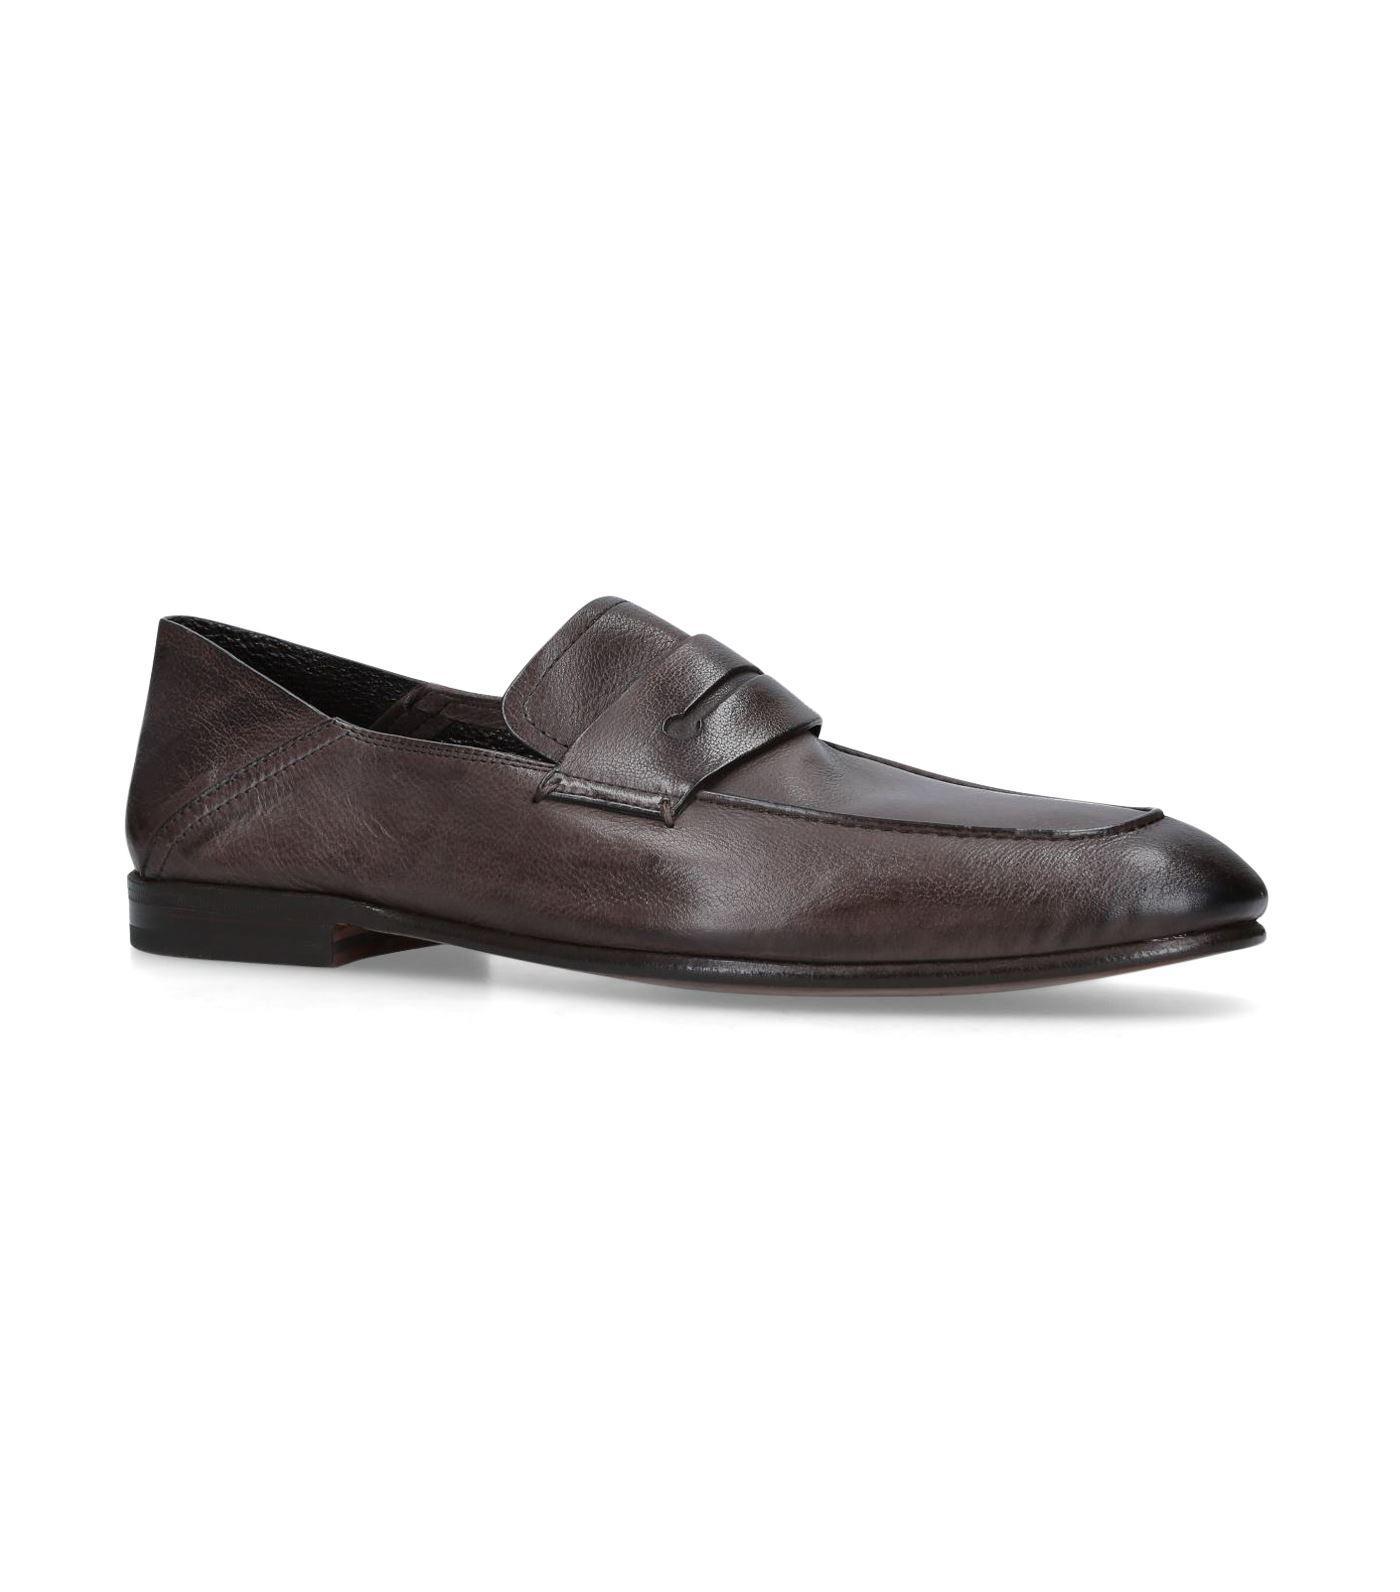 4a7a4a14e00 Ermenegildo Zegna Leather Asola Penny Loafers in Brown for Men ...